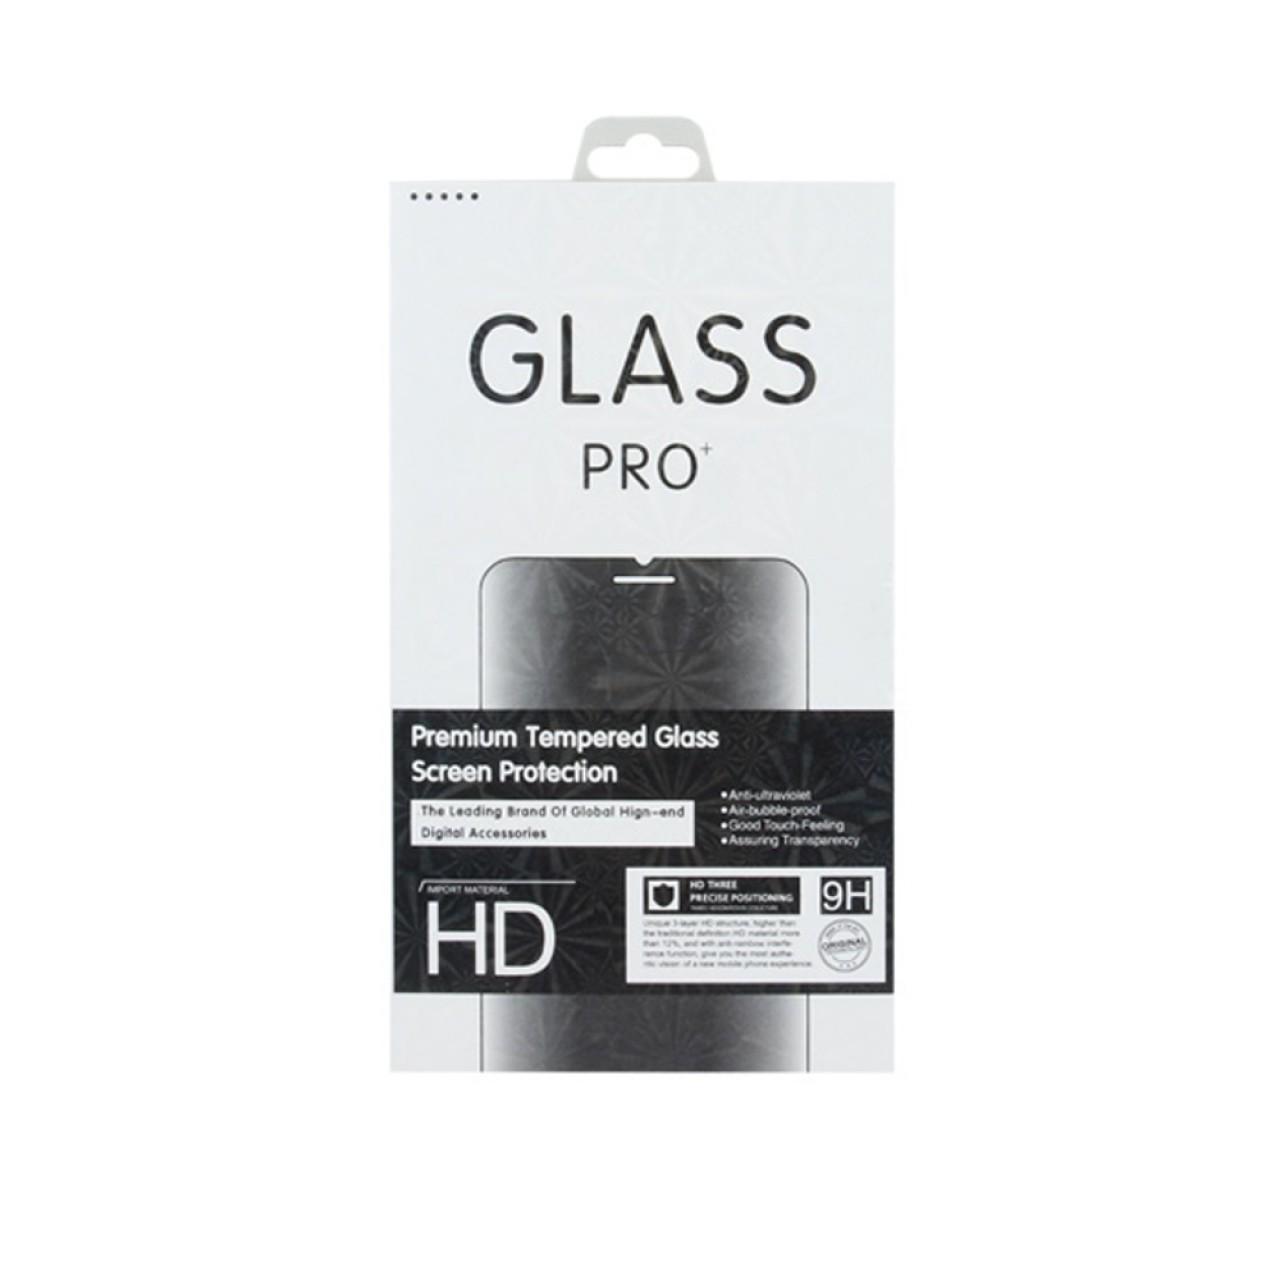 TEMPERED GLASS PREMIUM - ΠΡΟΣΤΑΤΕΥΤΙΚΟ ΤΖΑΜΙ ΟΘΟΝΗΣ ΓΙΑ XIAOMI REDMI NOTE 8 PRO ΔΙΑΦΑΝΟ - OEM